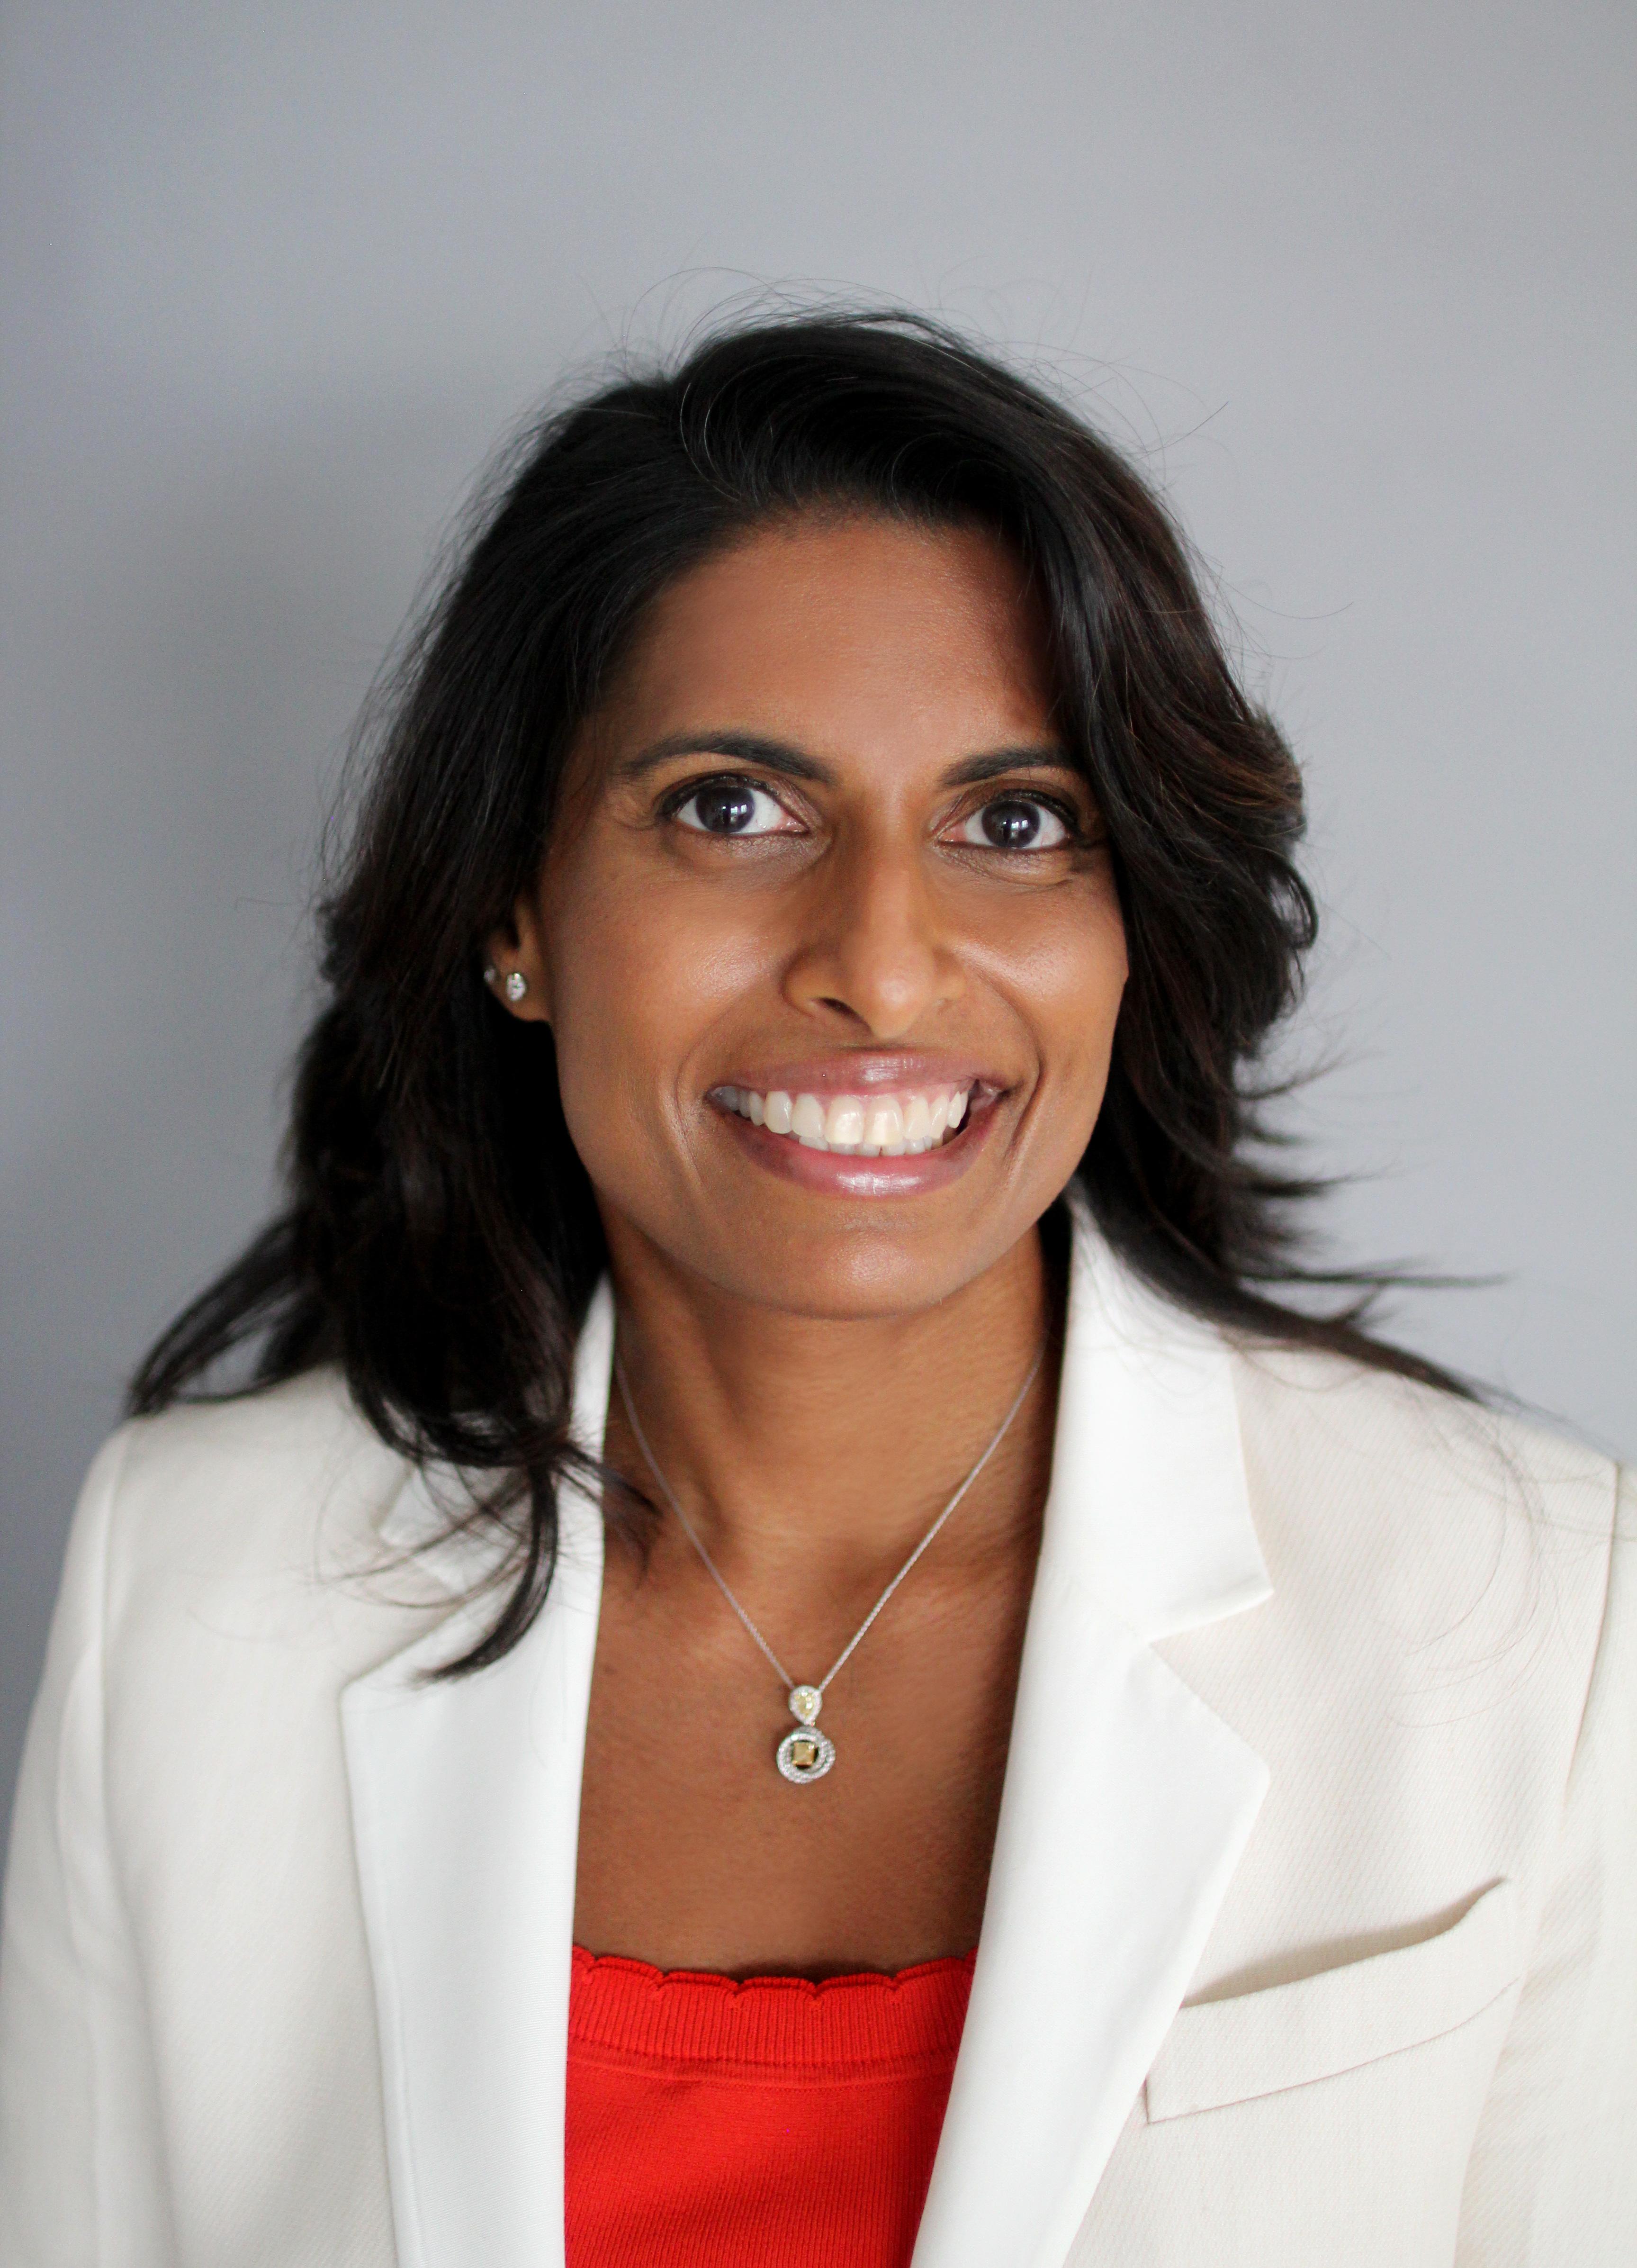 Fazeela Abdul Rashid